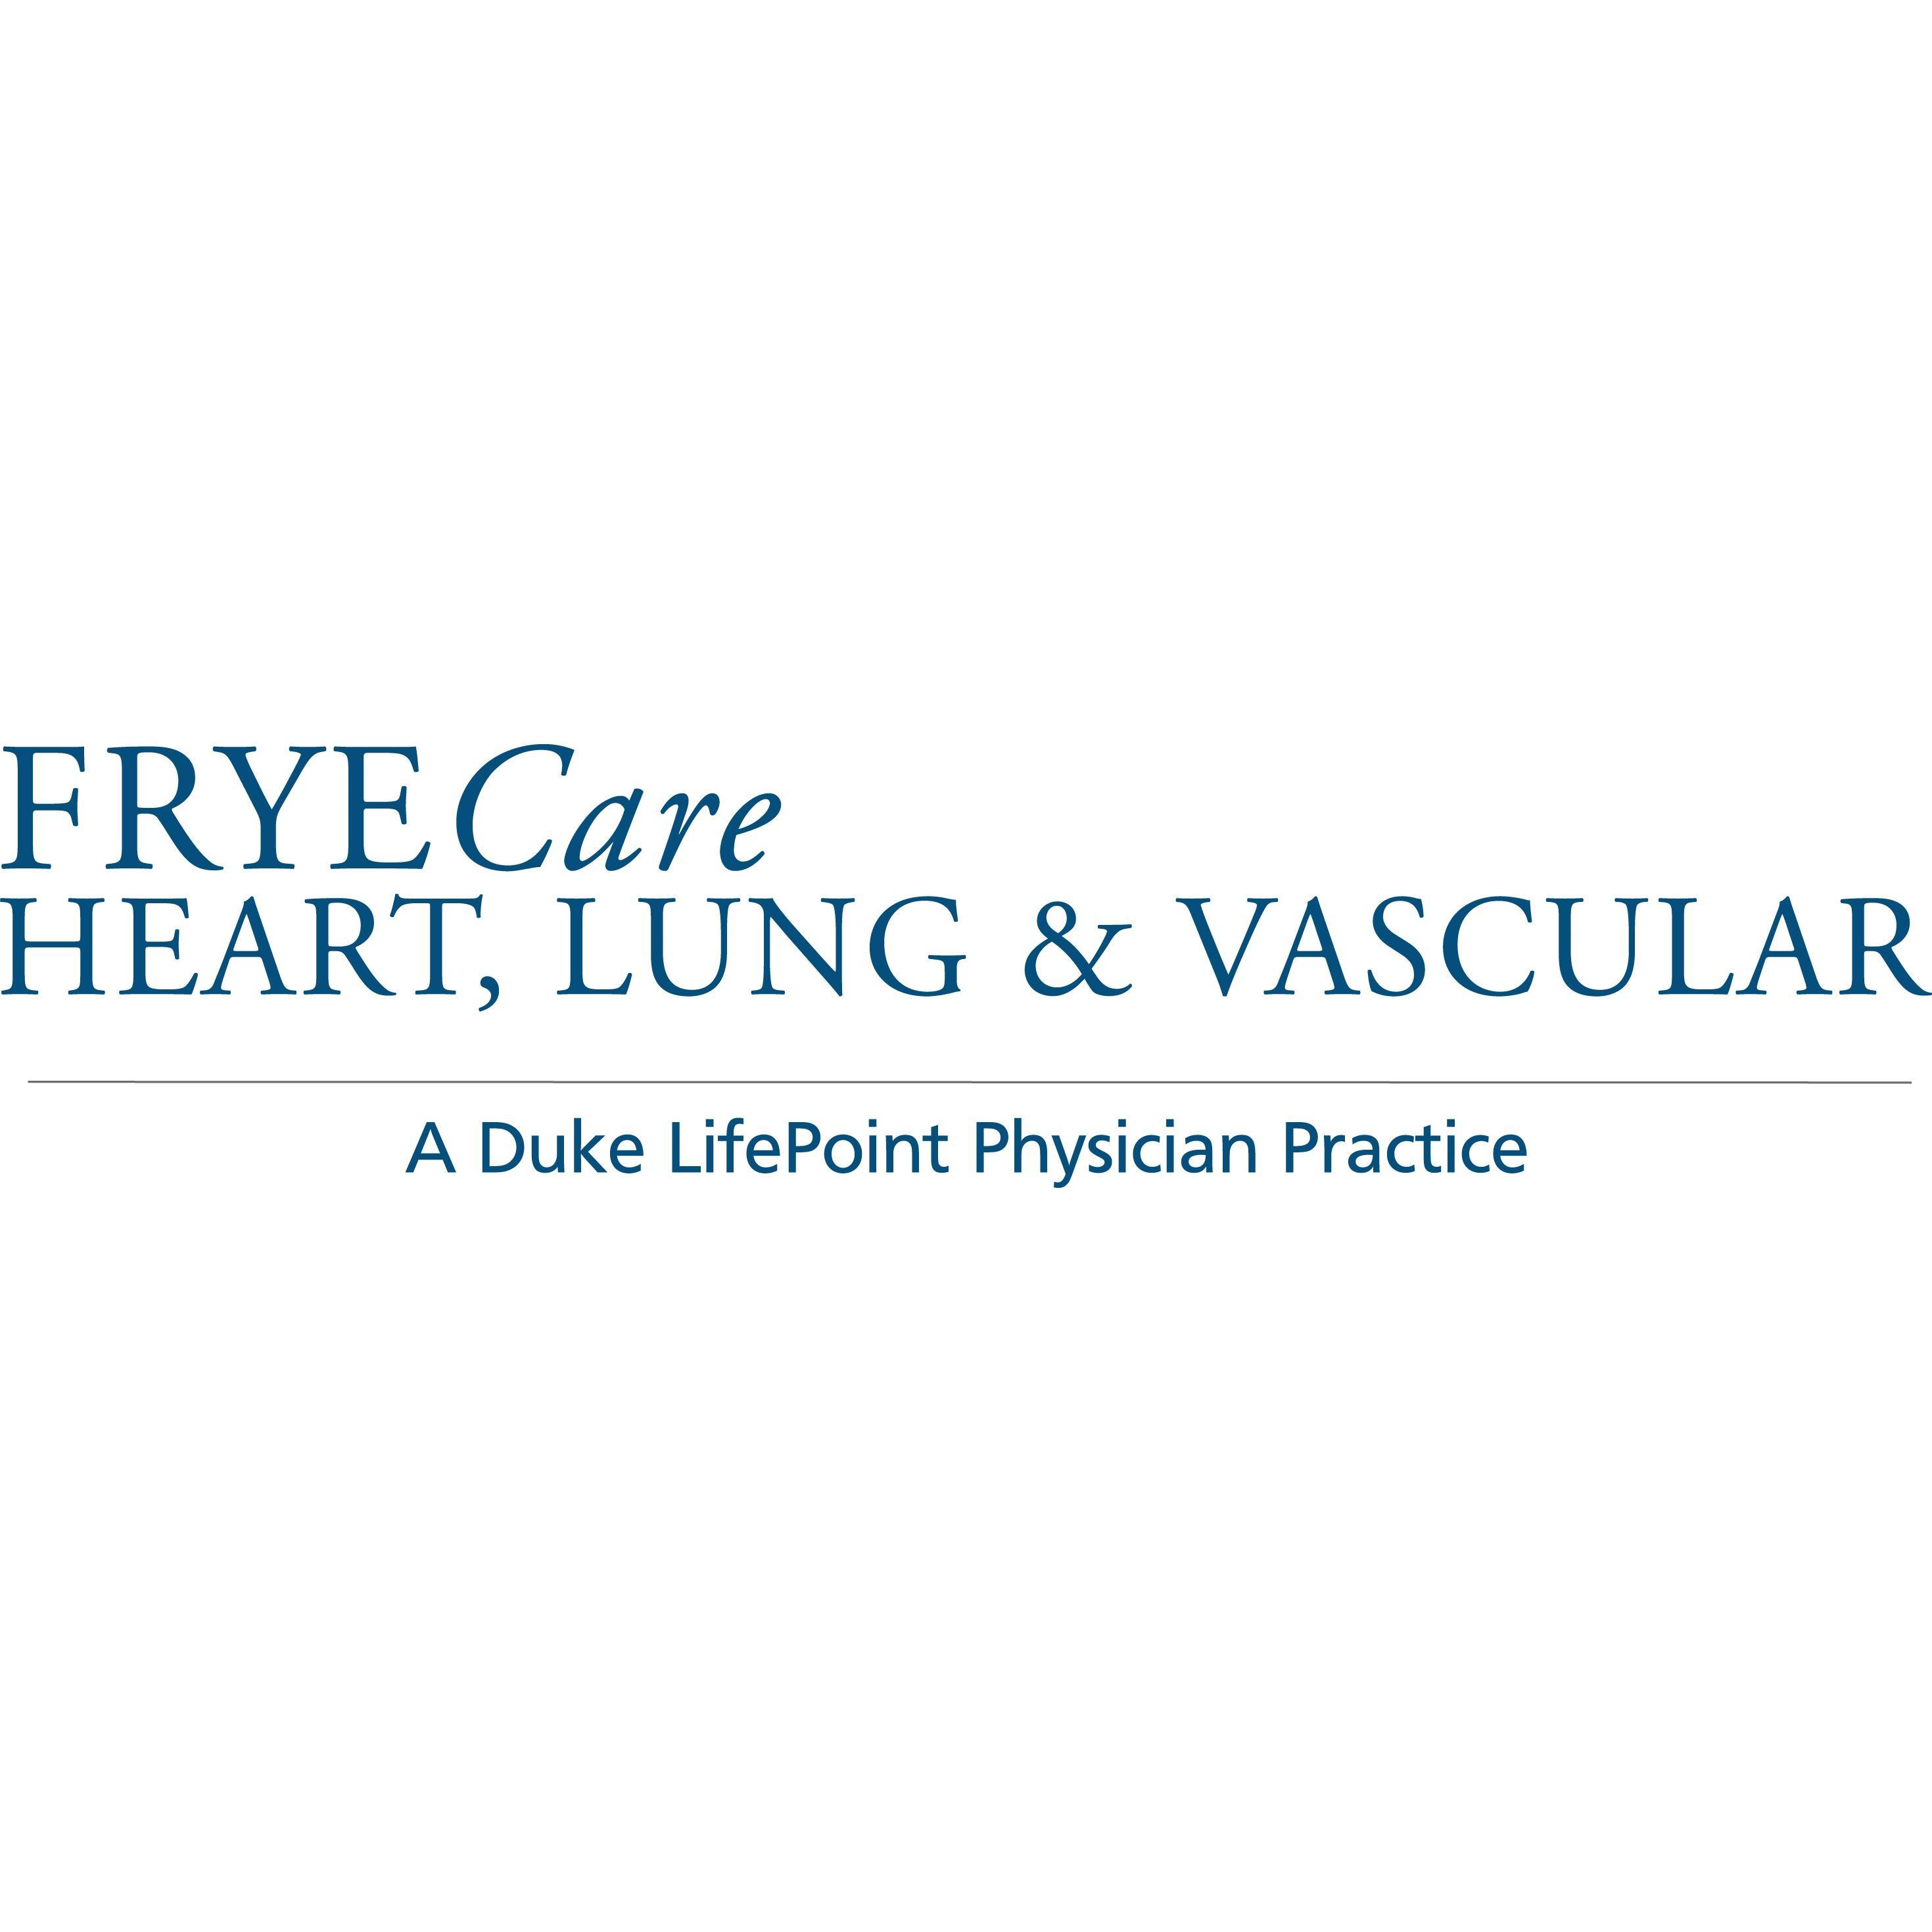 FryeCare Heart Lung & Vascular